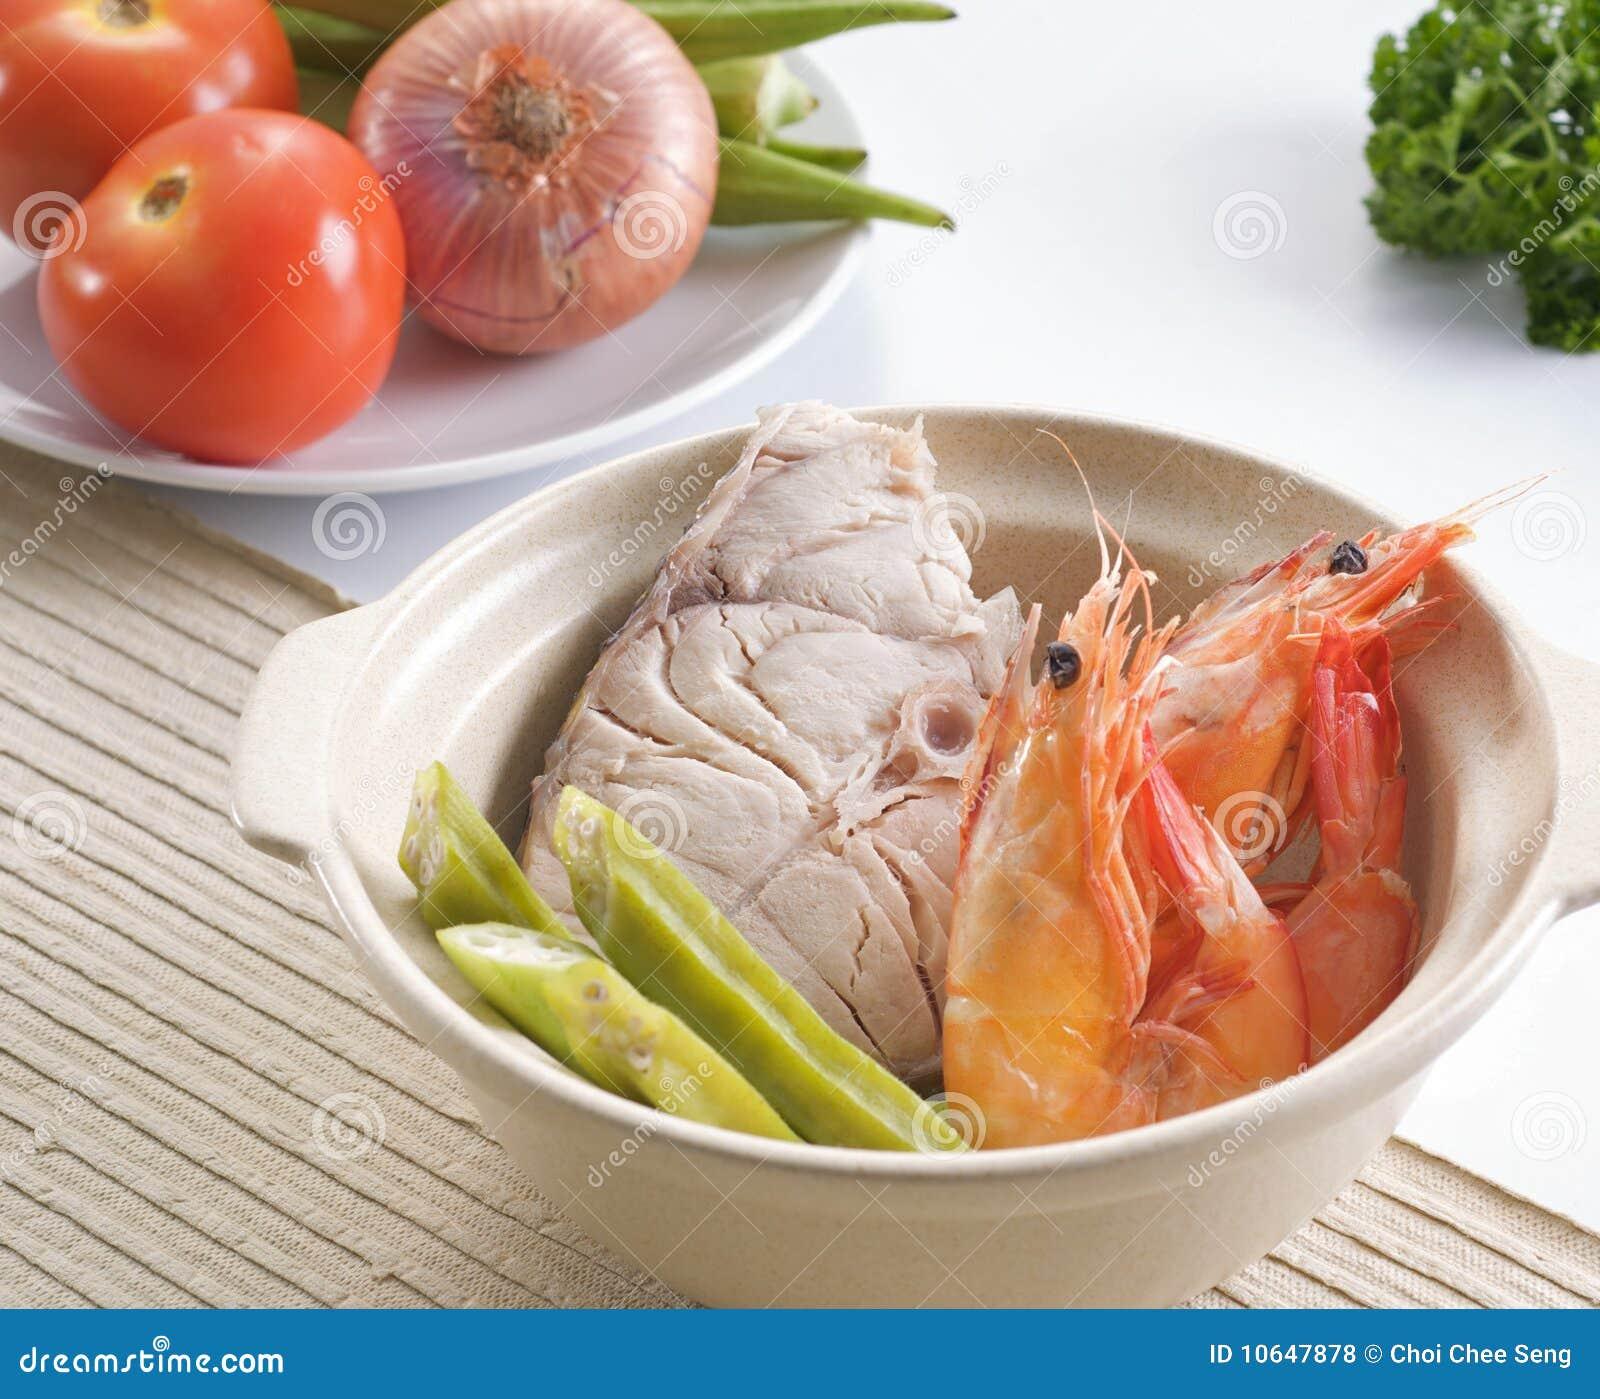 Prawn And Fish Royalty Free Stock Photos Image 10647878